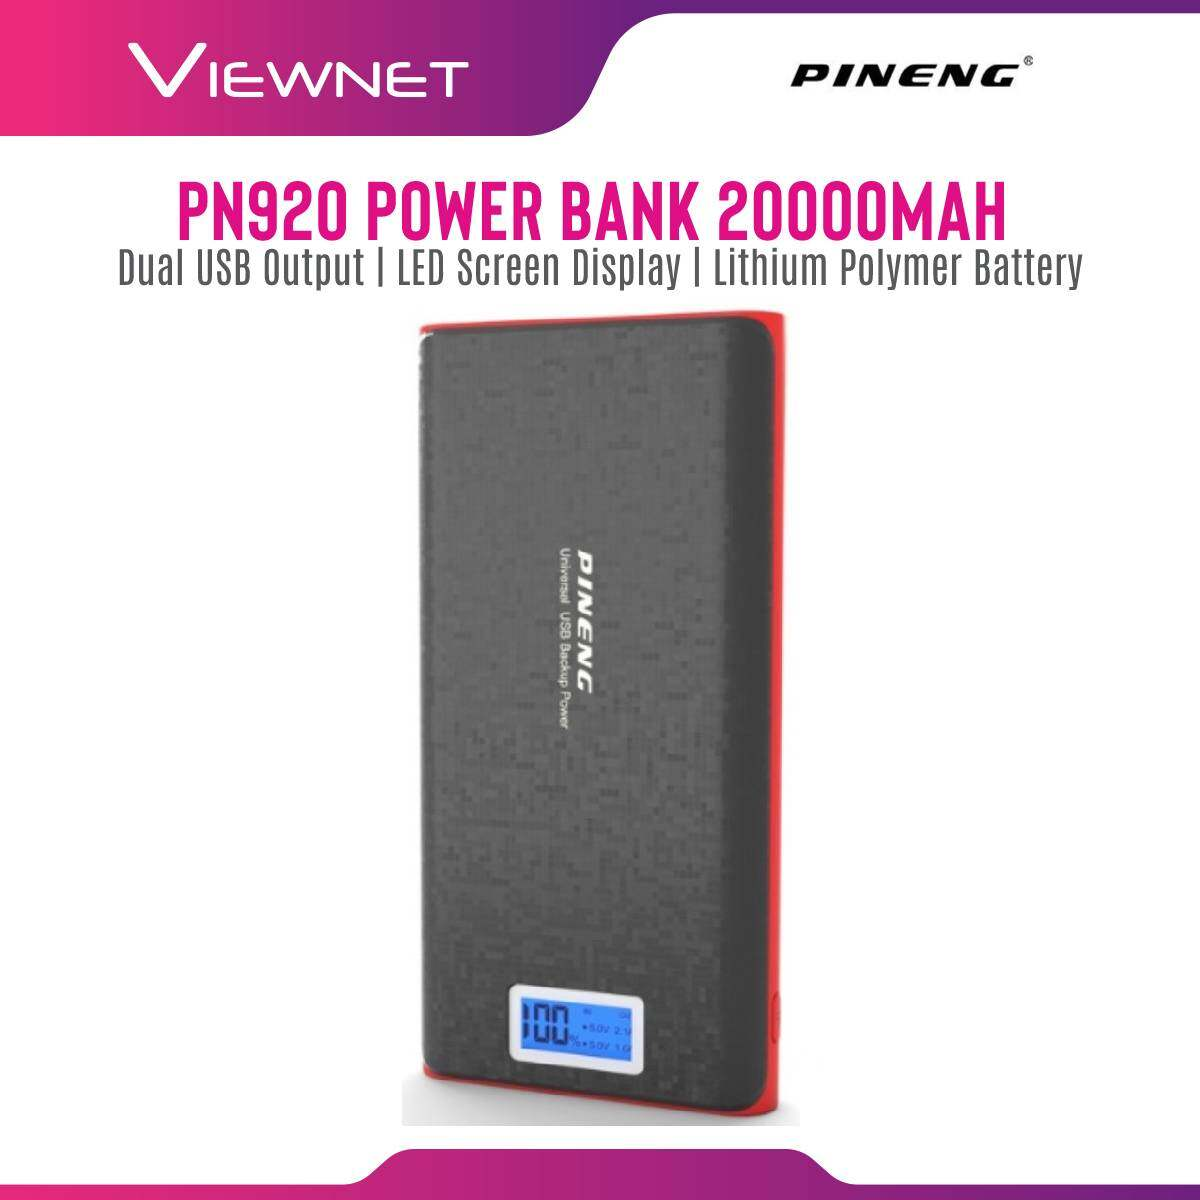 Pineng 20000mAh Power Bank (PN-920) 2-Out, 2.1A, Fast Charging Input 5V 2.0A, Dual Output 5V 1.0A & 2.1A